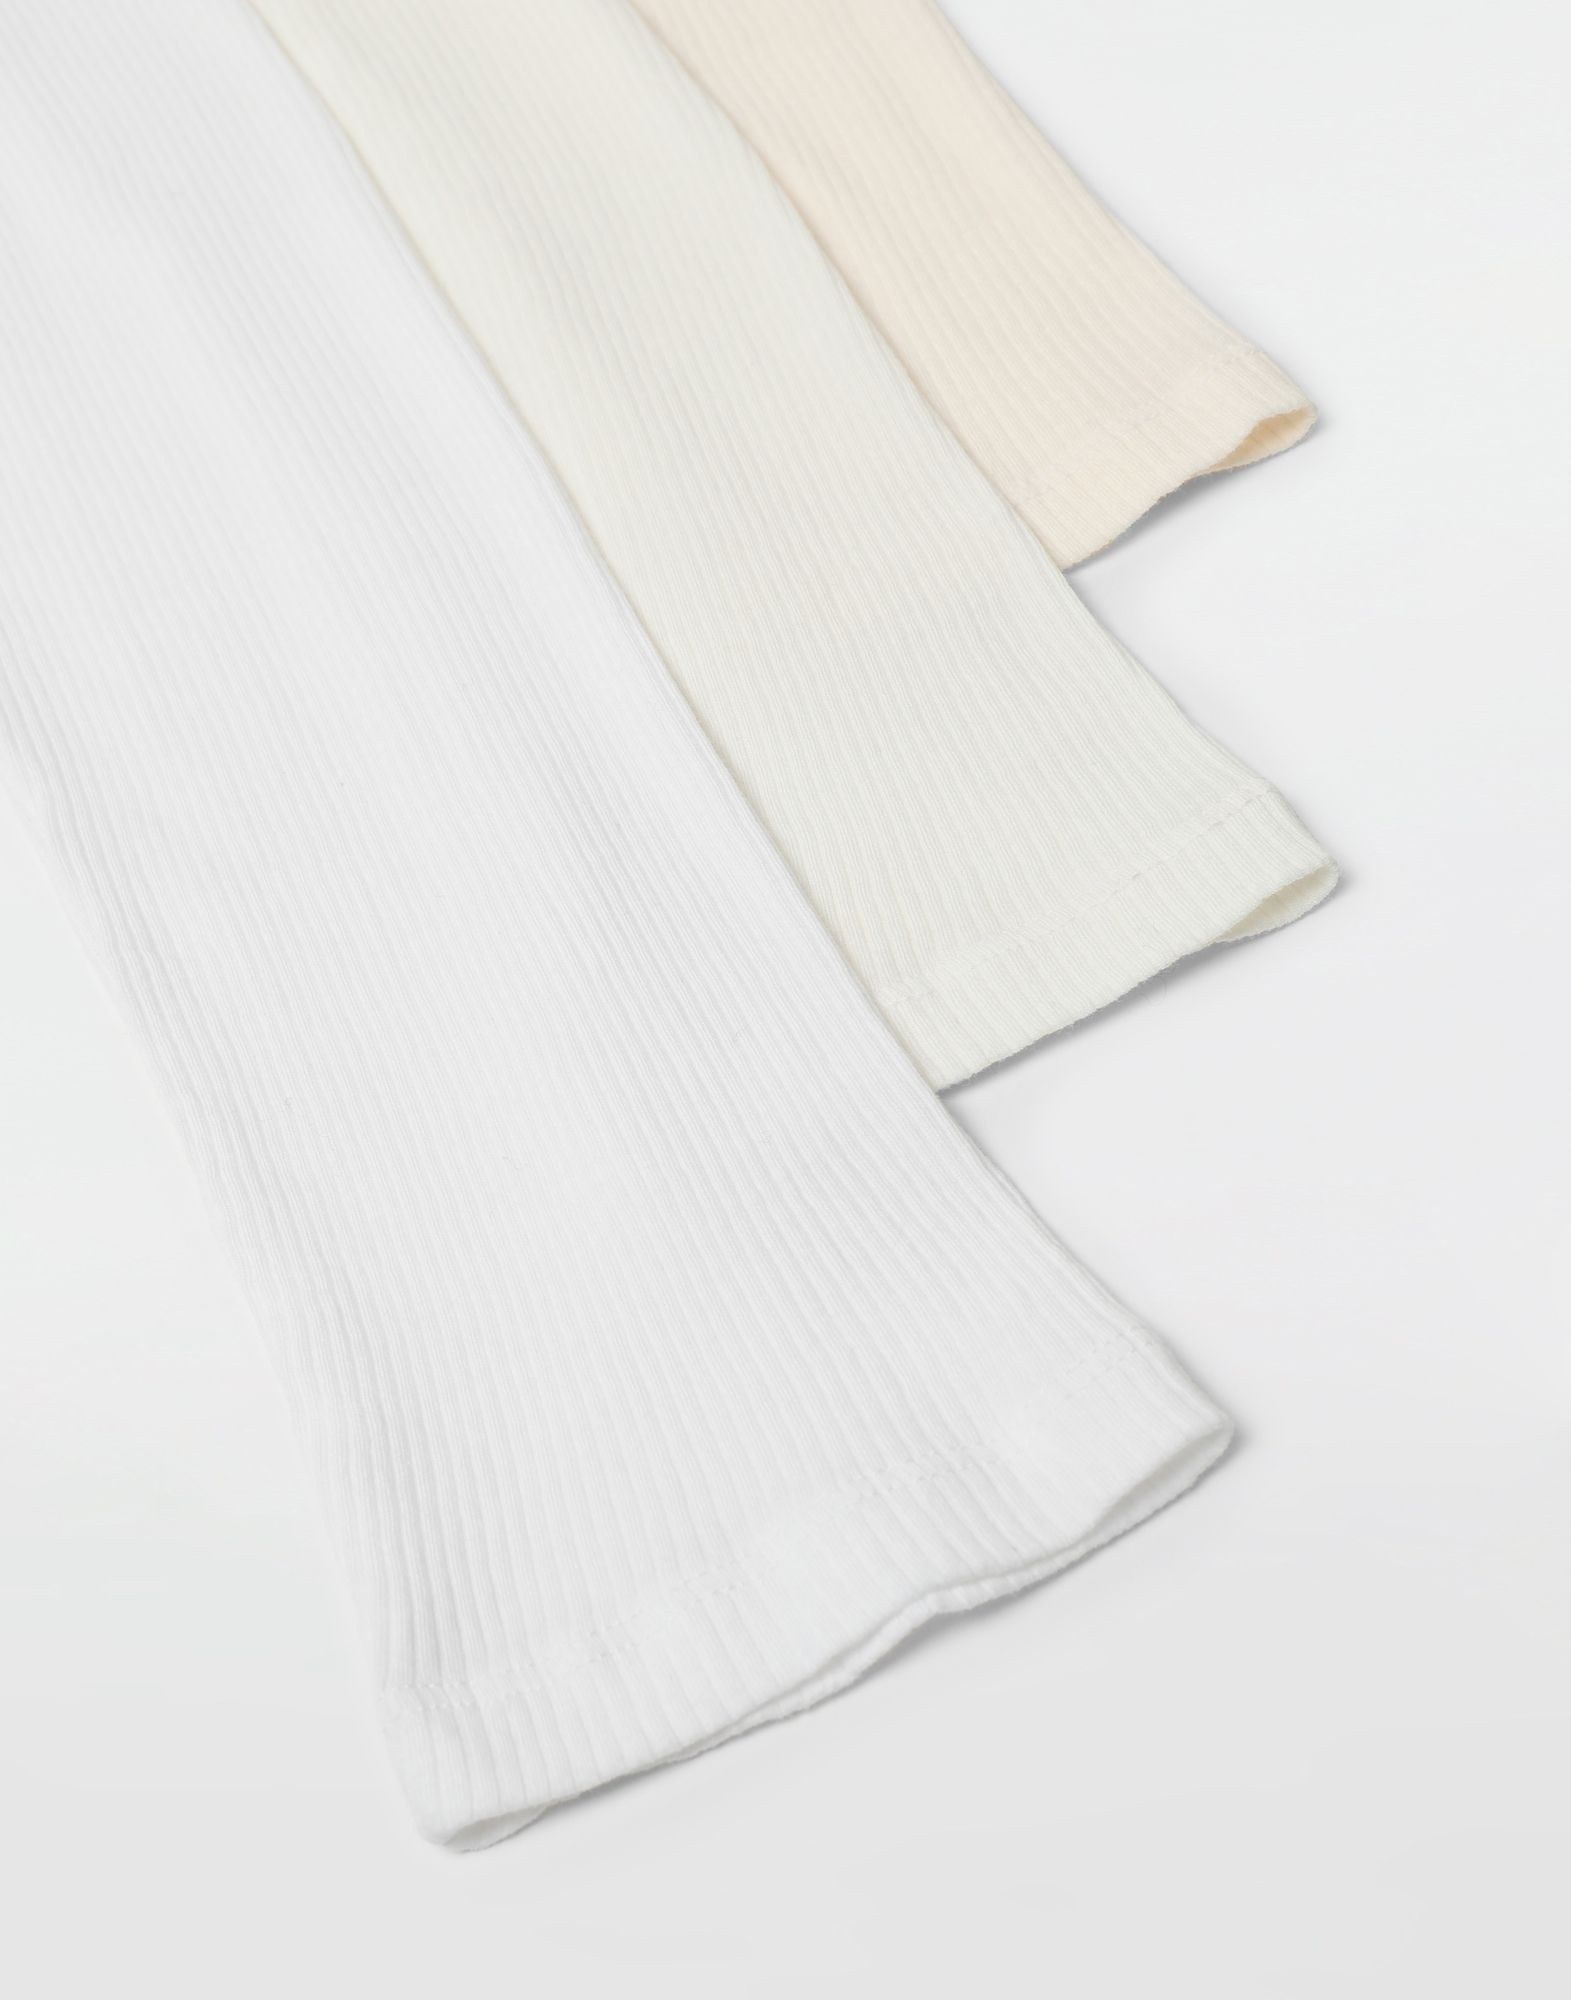 MAISON MARGIELA 3-pack Stereotype white T-shirts Long sleeve t-shirt Man e